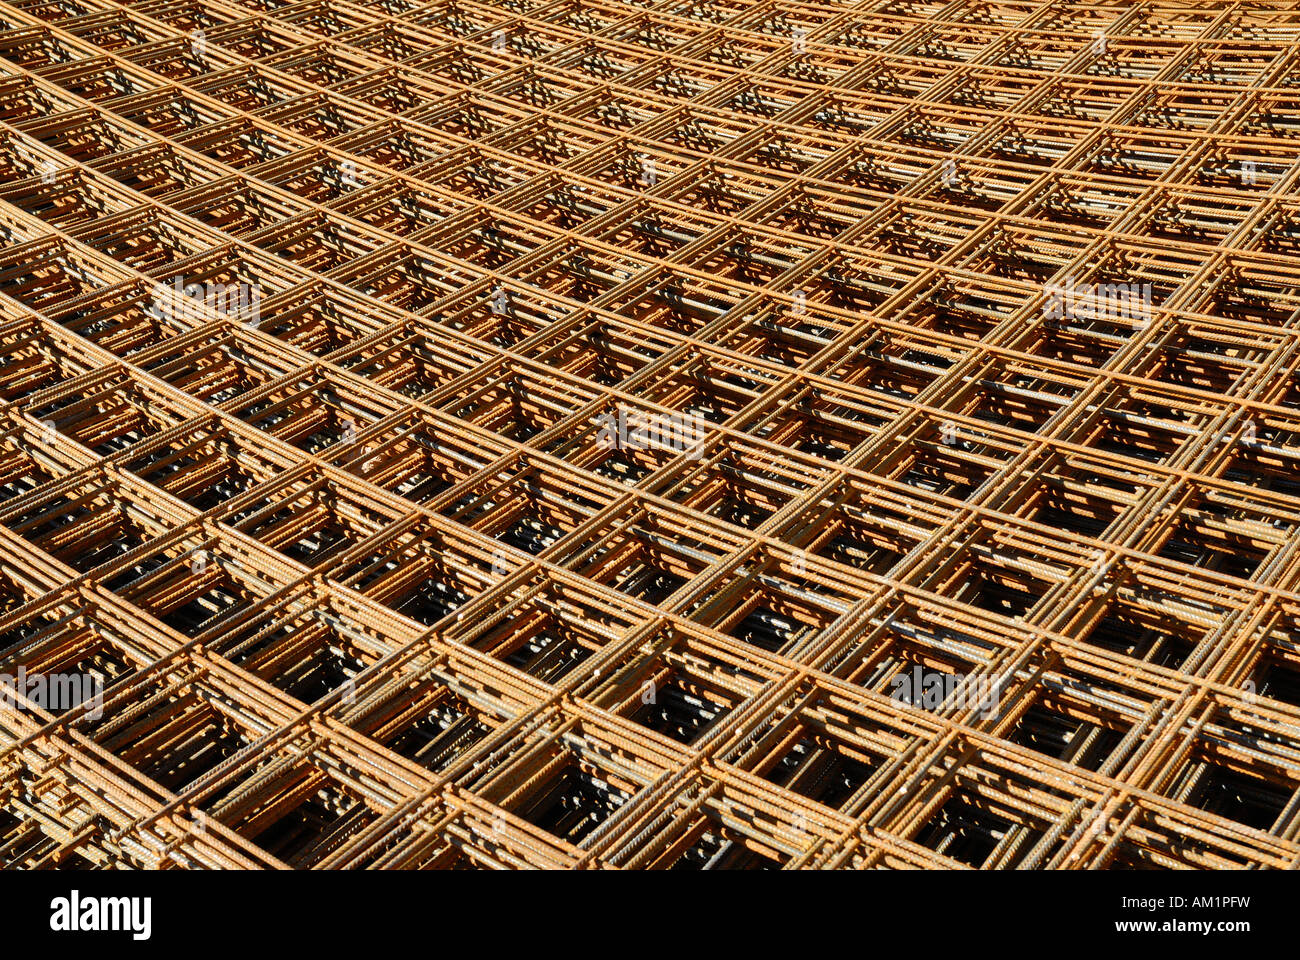 Rusty mats of rebar. - Stock Image